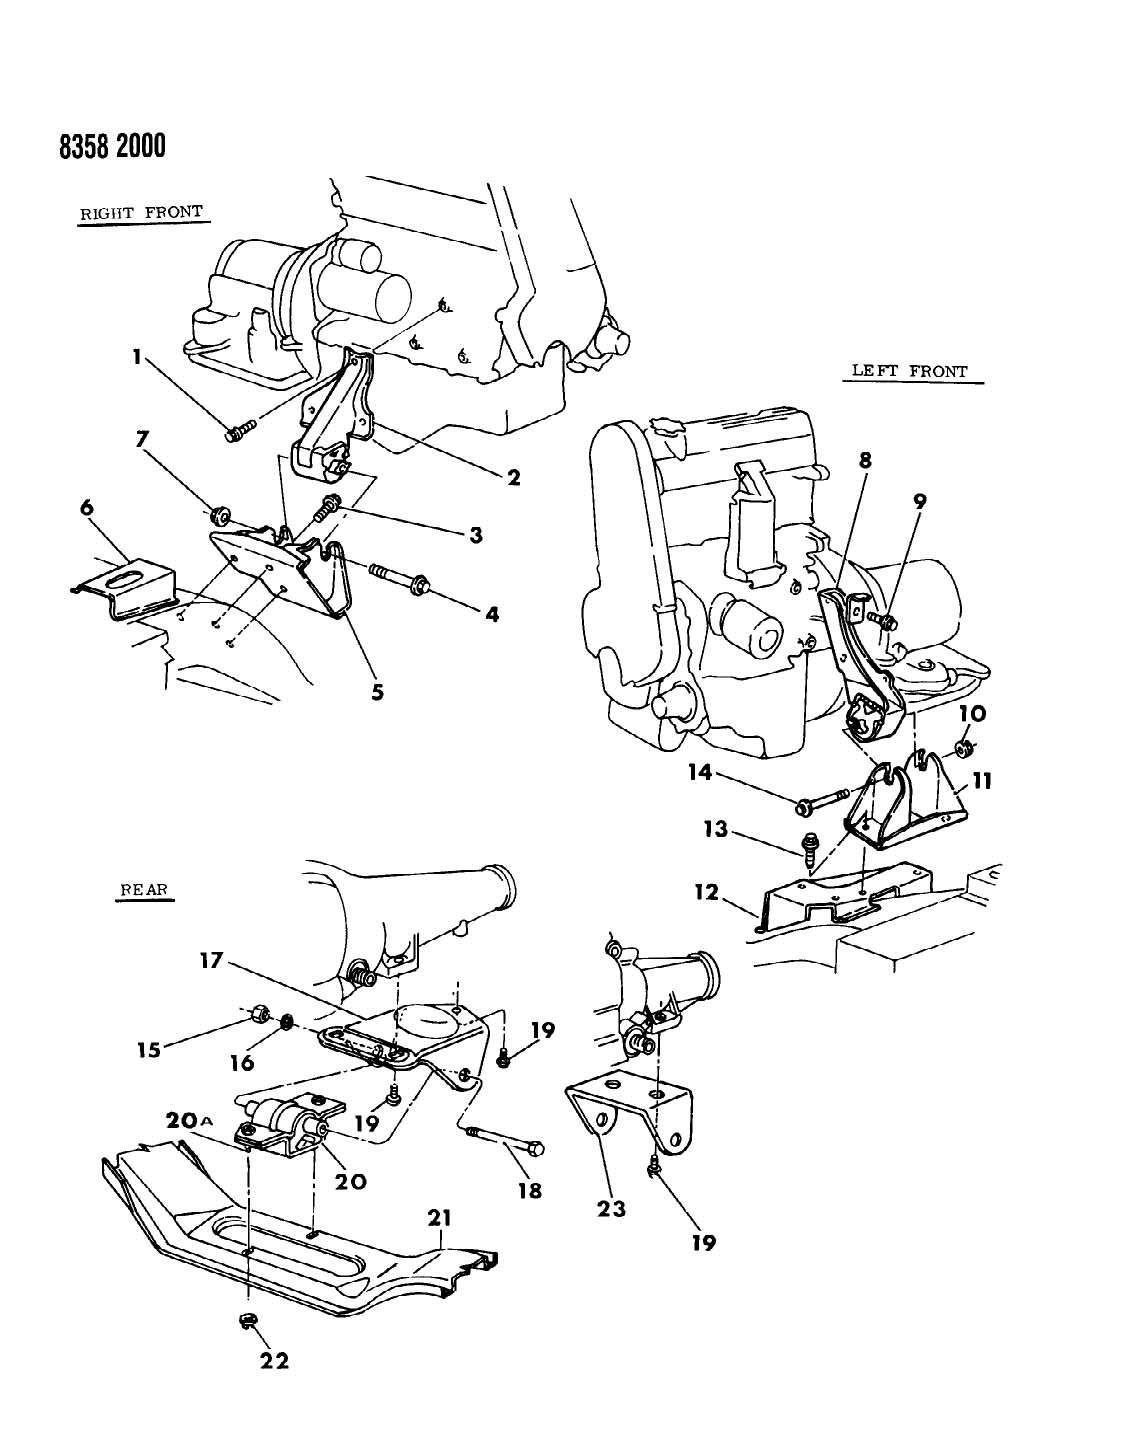 Parts Home Truck Parts Dodge Parts Dakota Parts 97 04